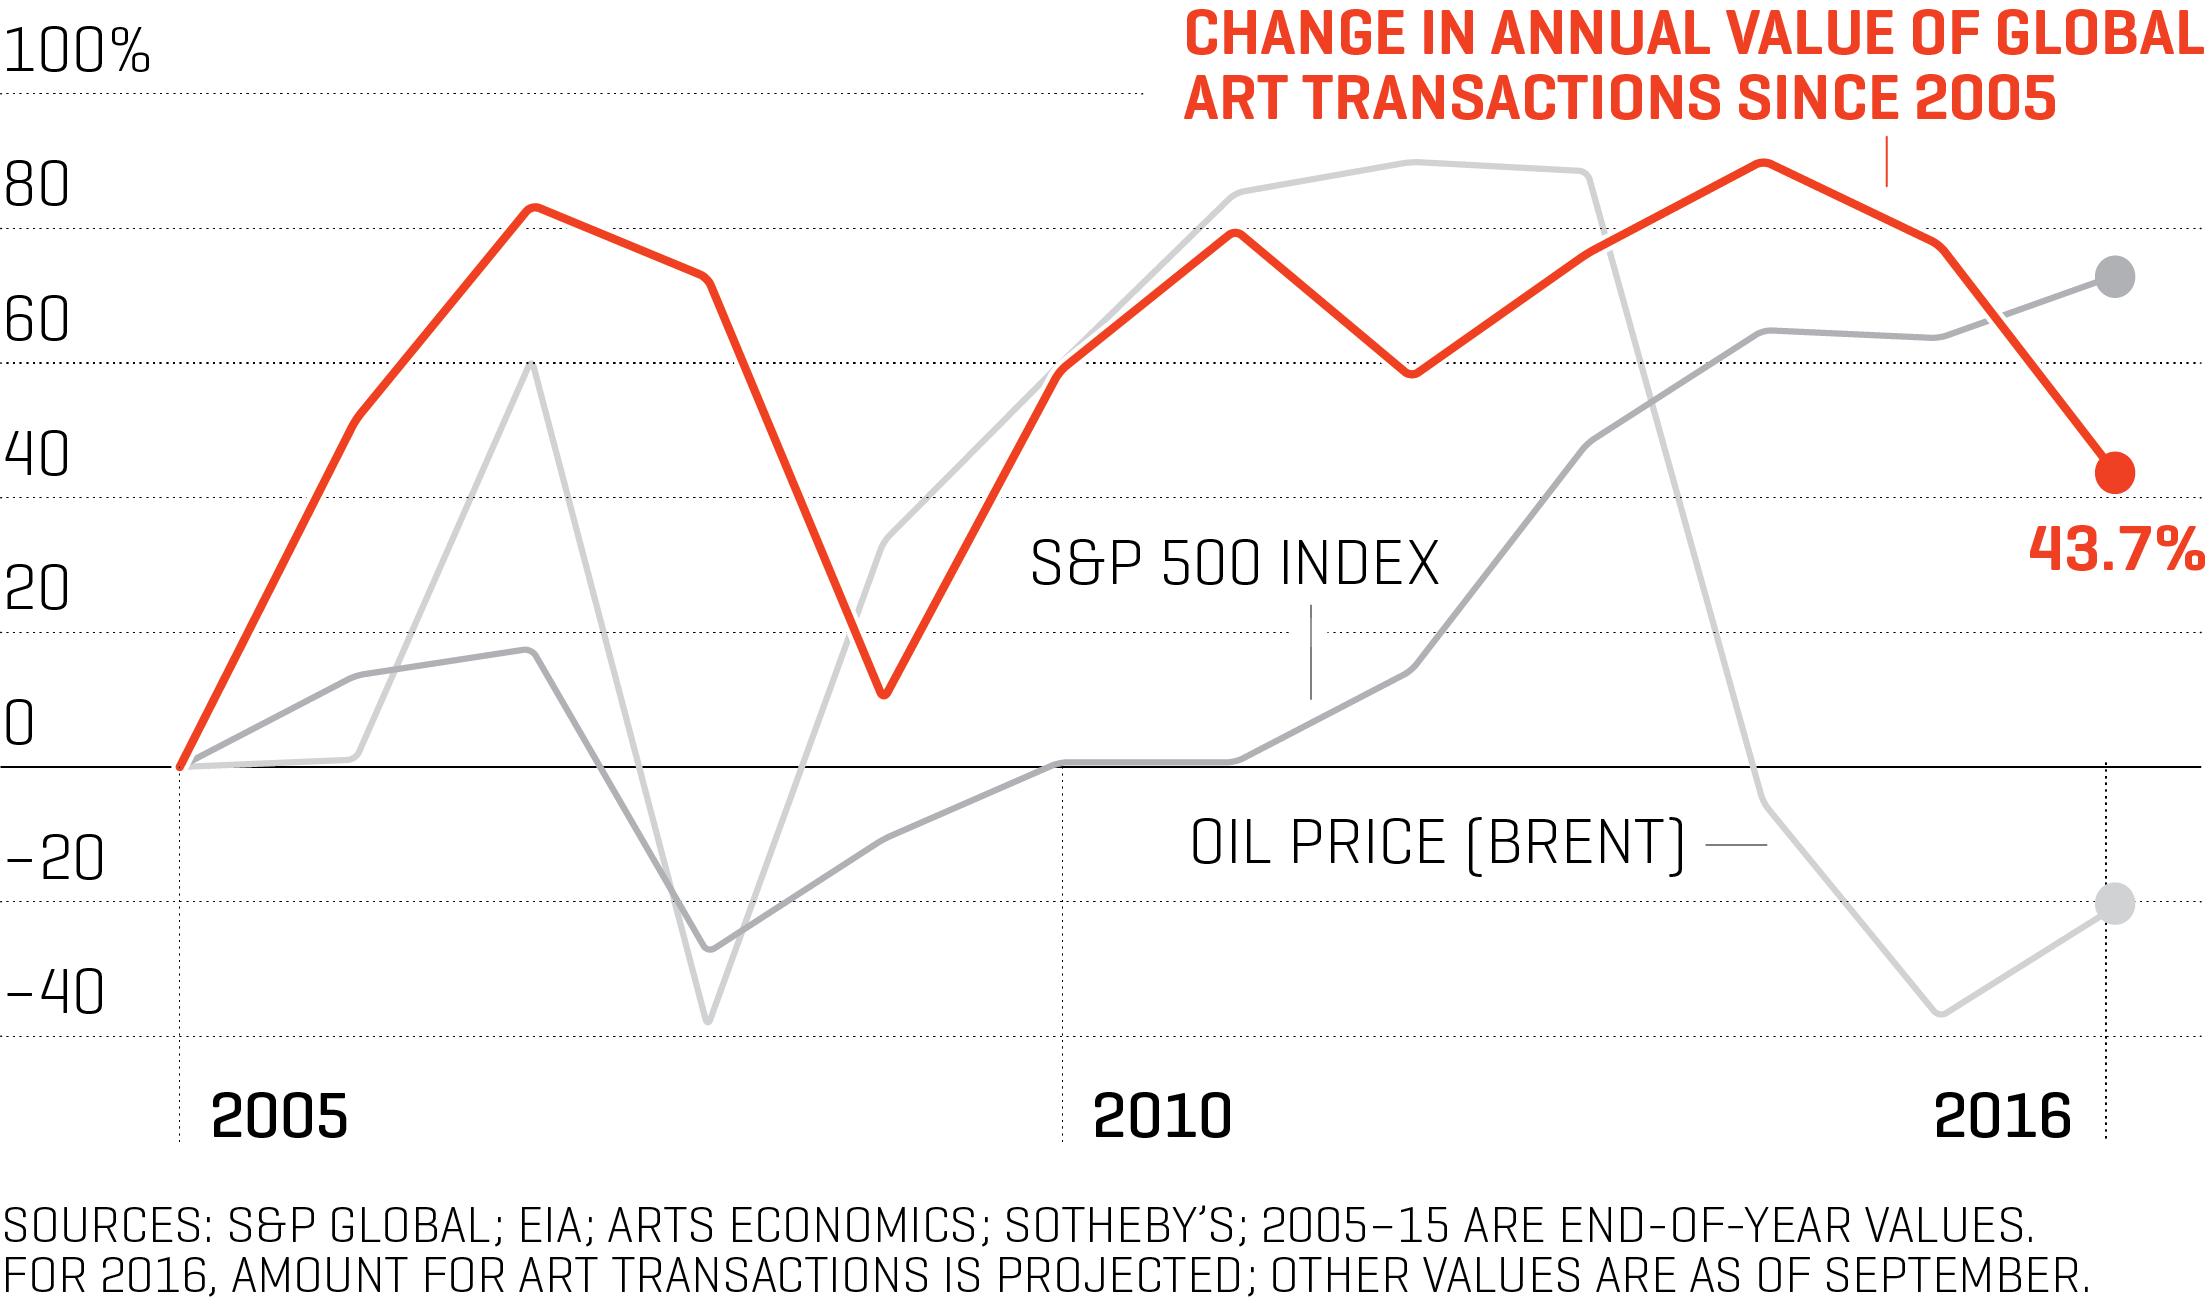 inv-10-01-16-chart-exp